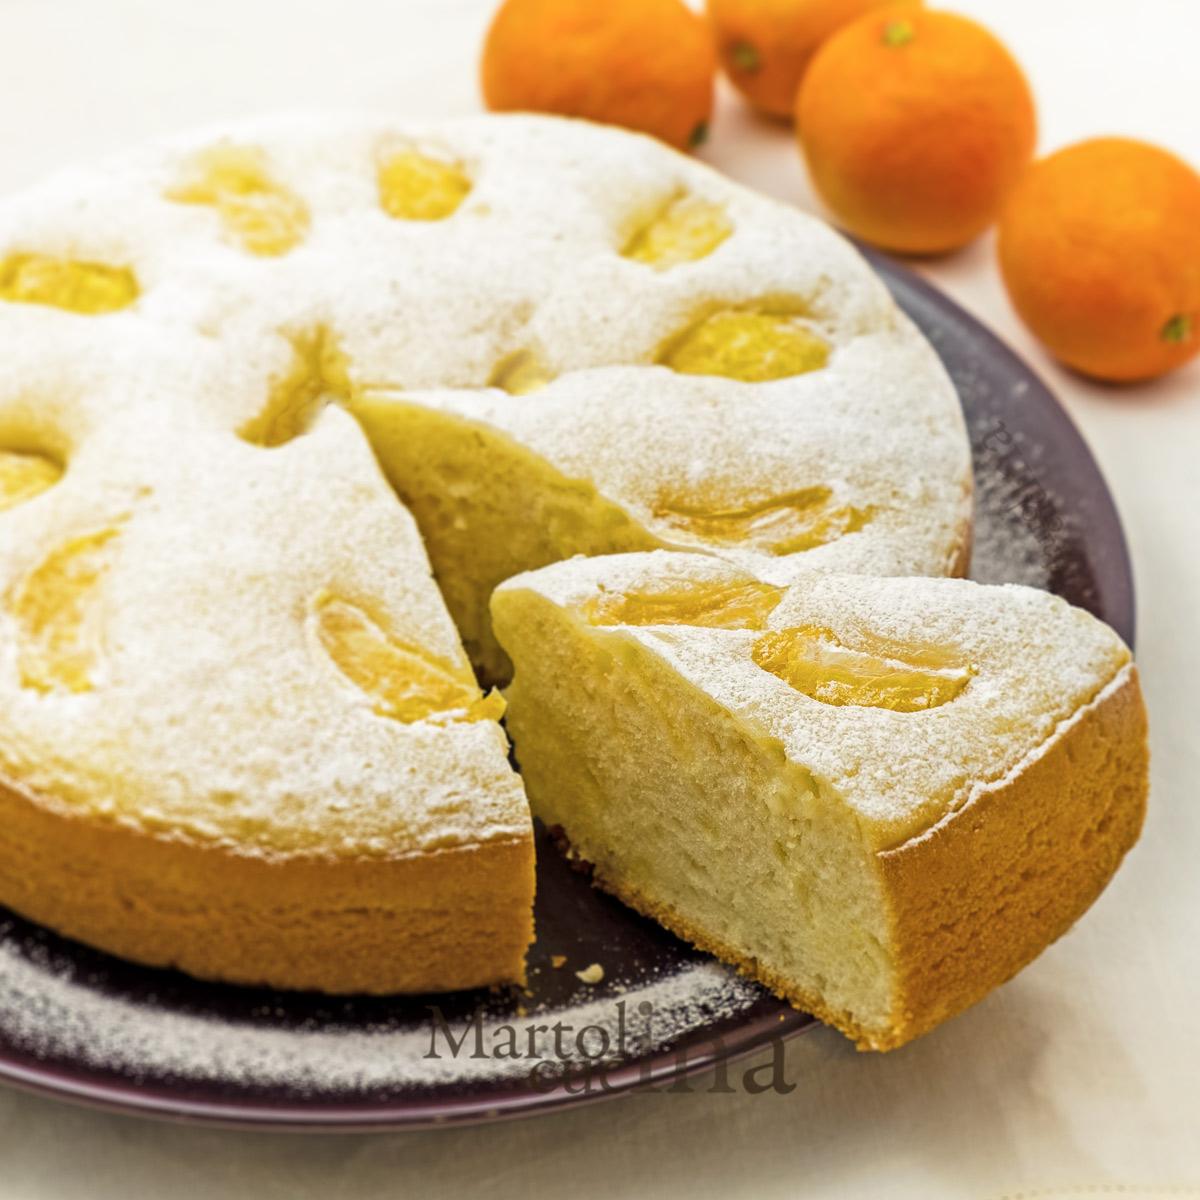 Dolce di mandarini frullati